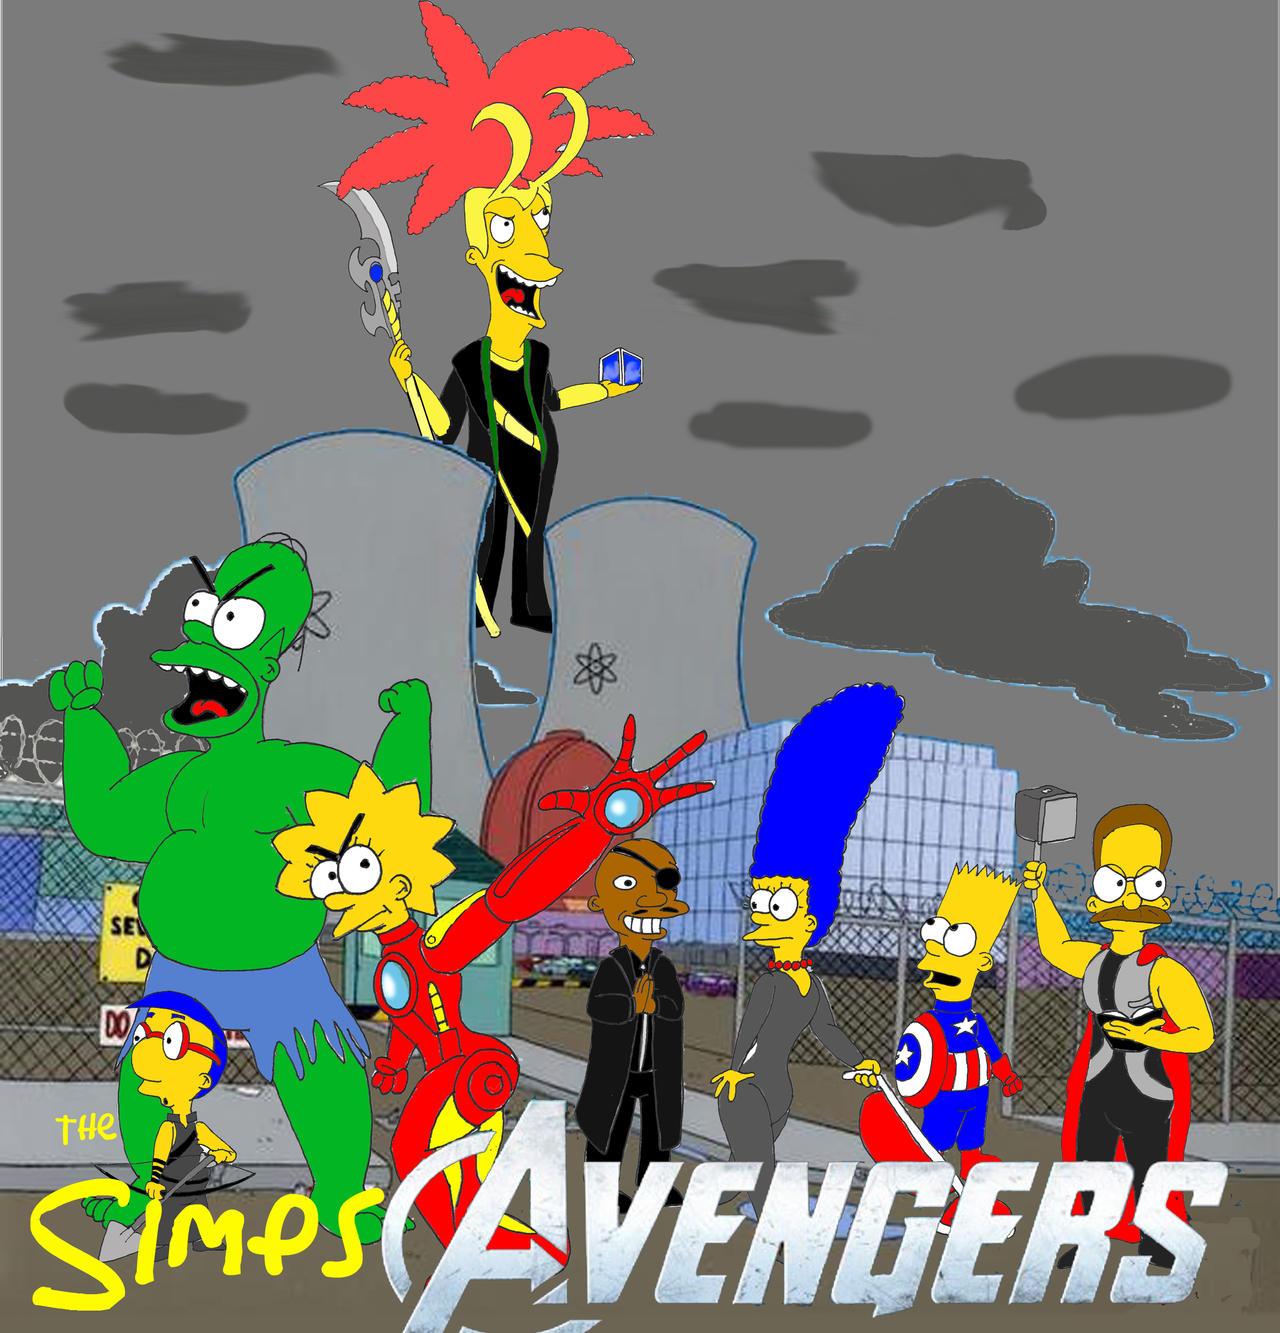 The SimpsAvengers by Trey-Vore